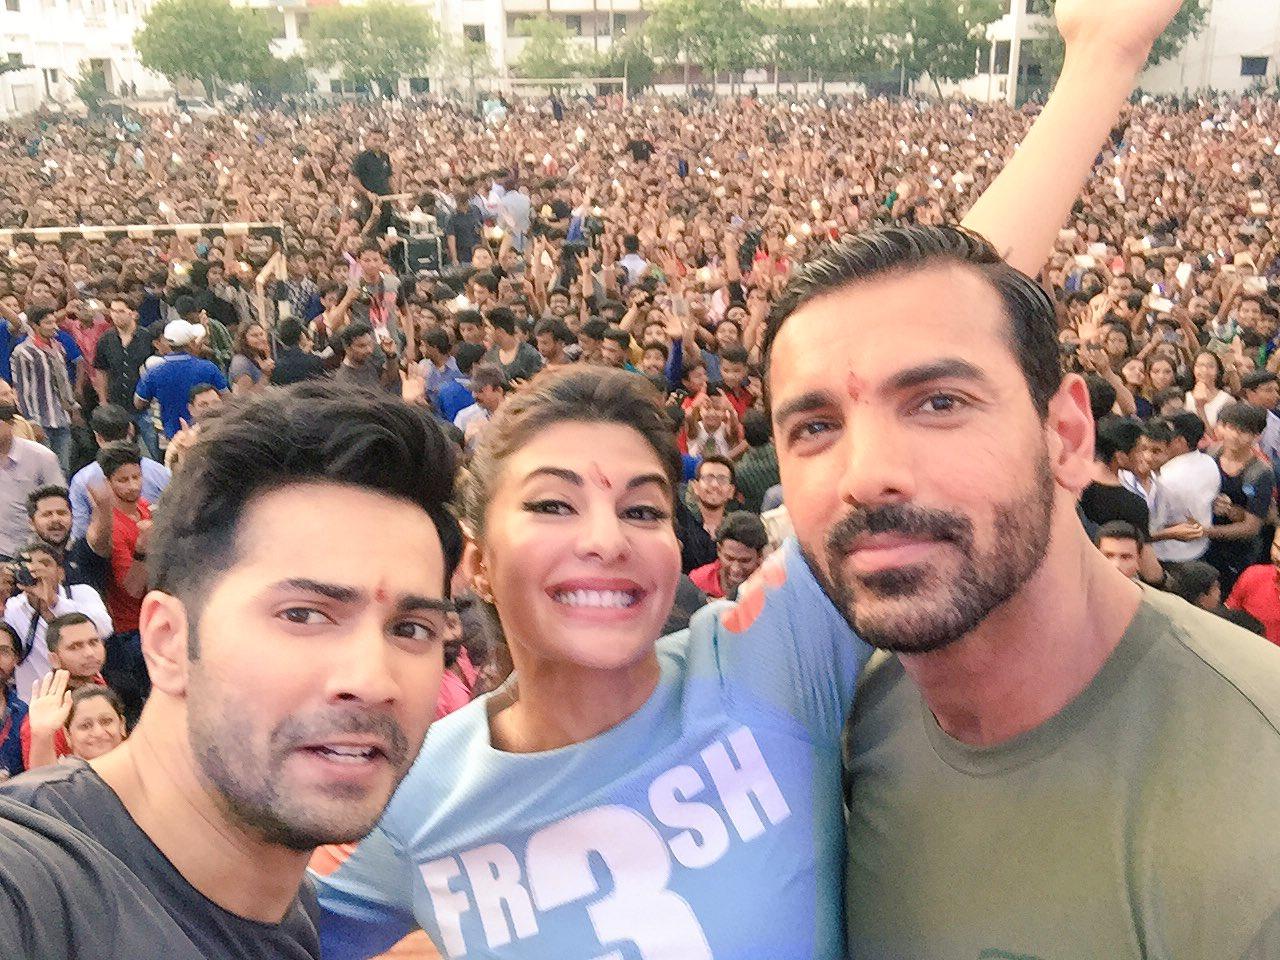 Varun, John & Jacqueline selfie with Fans